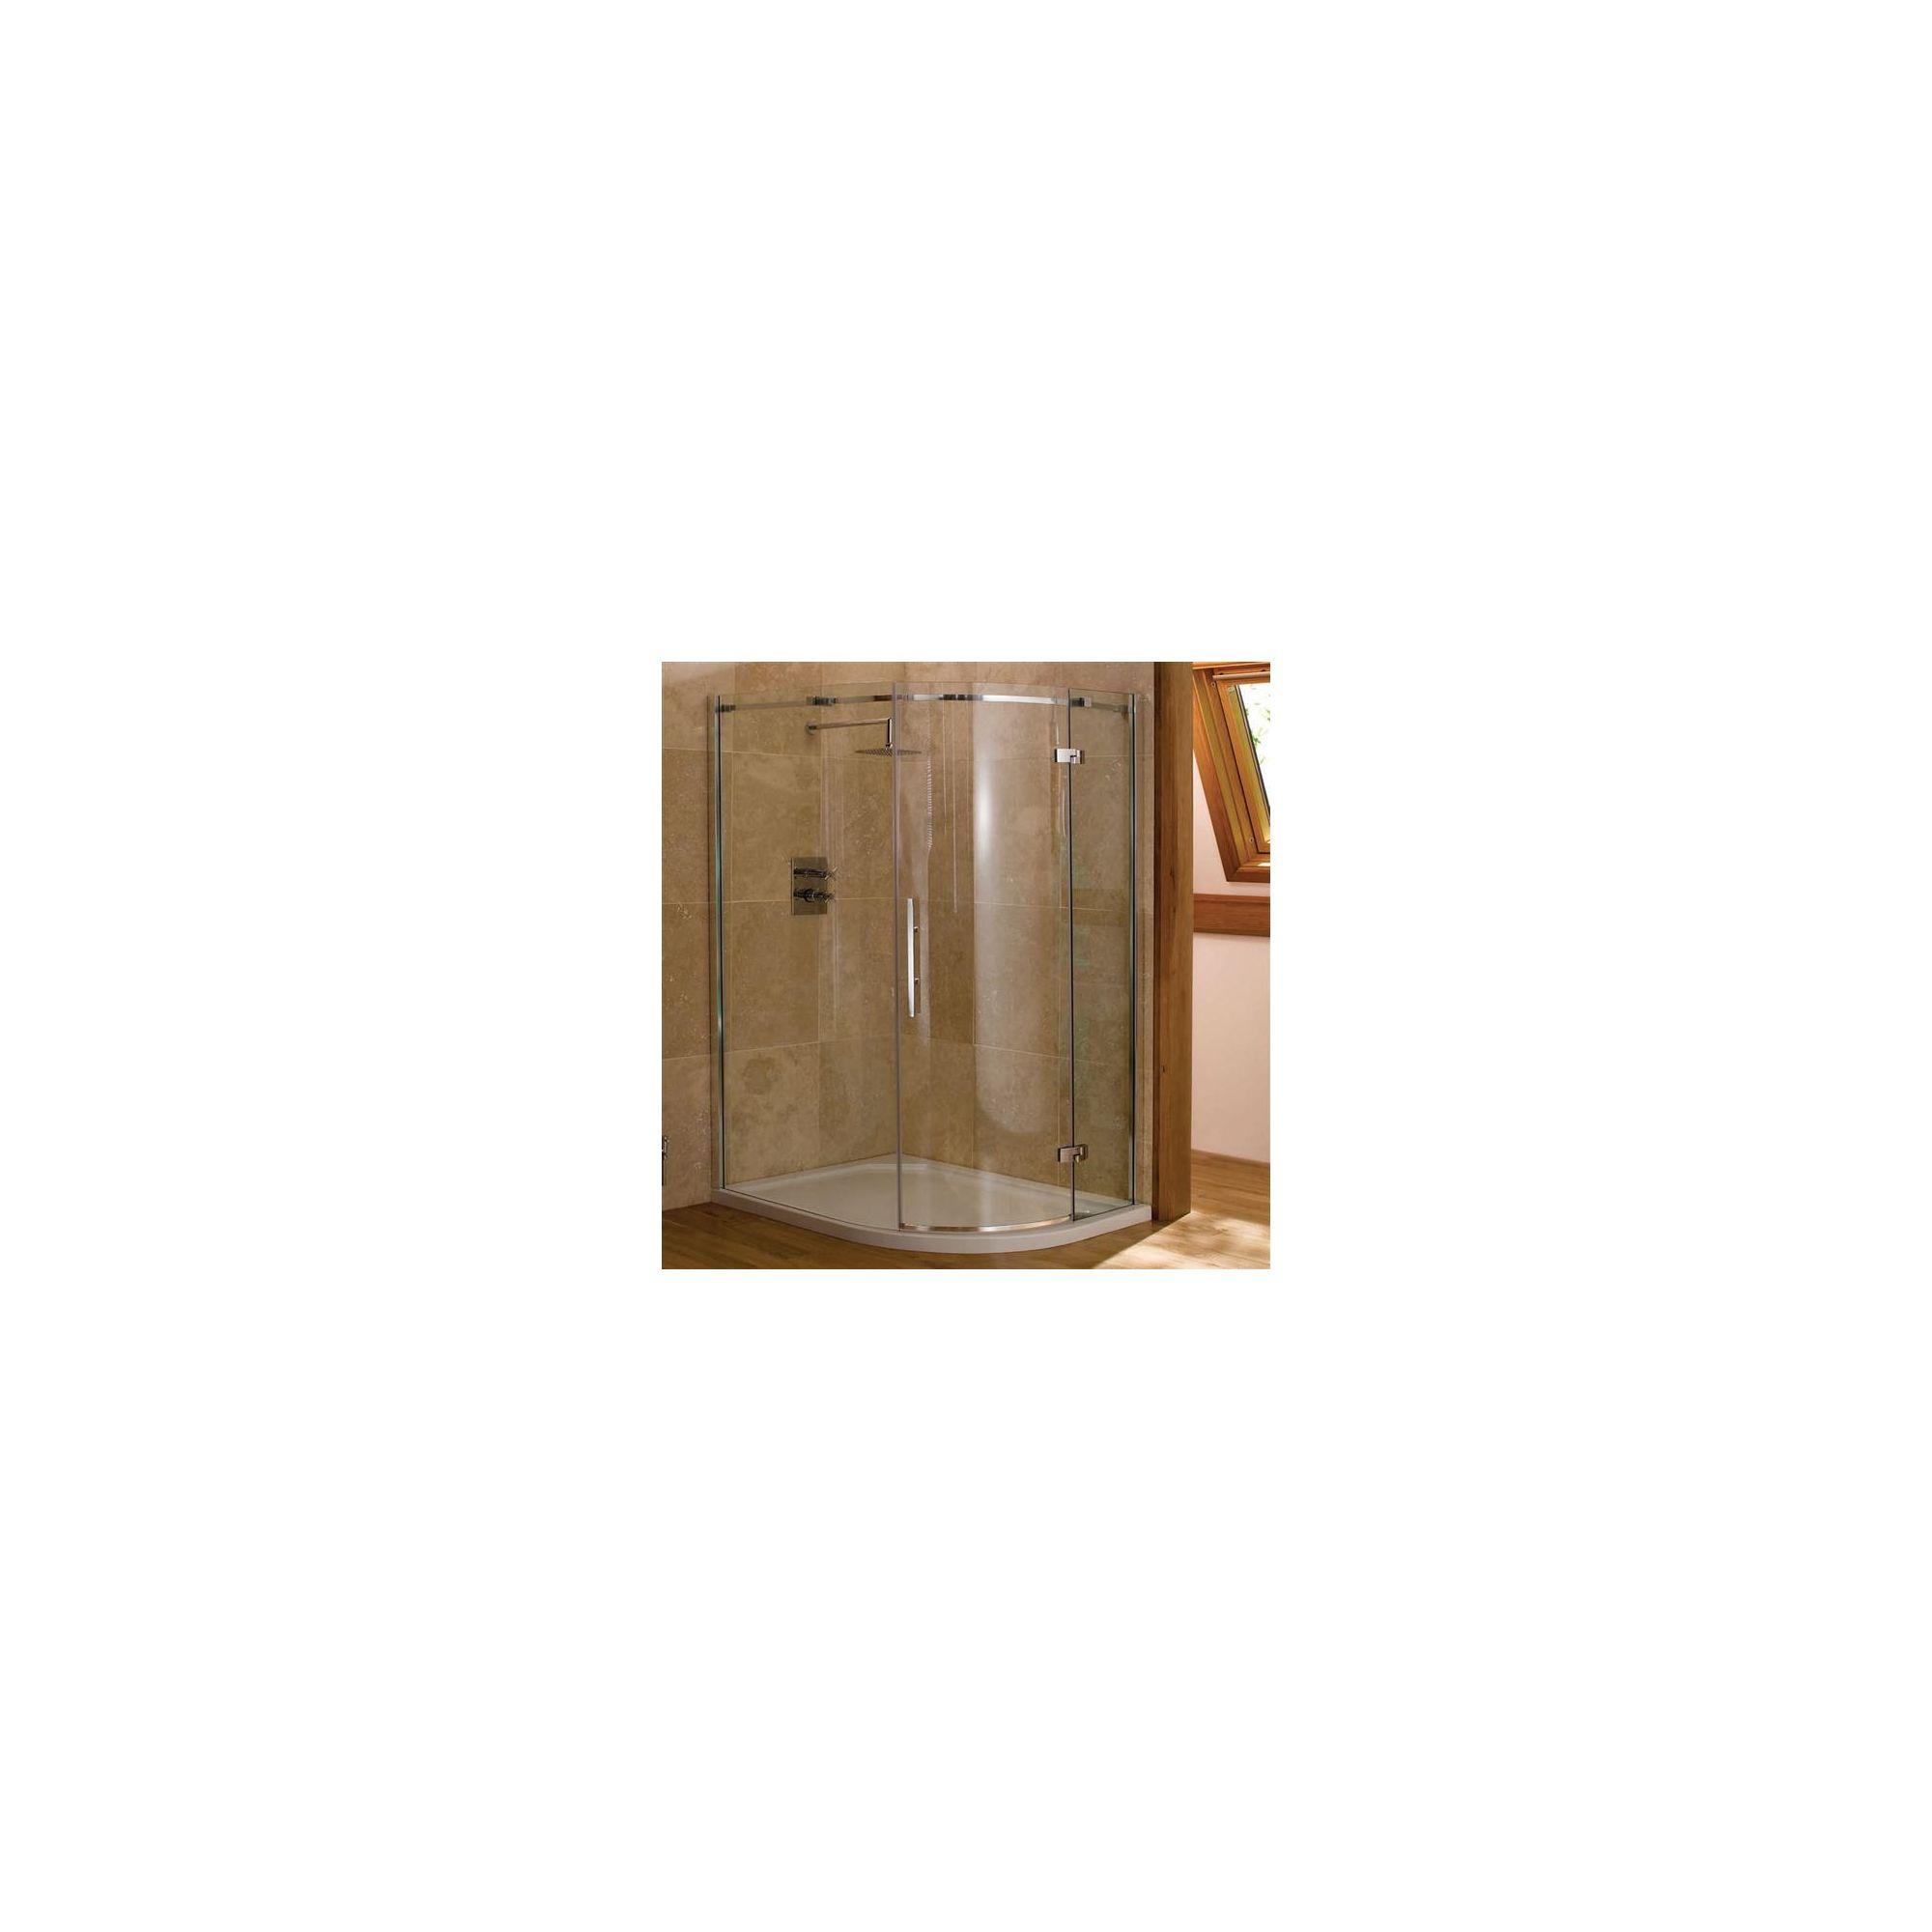 Merlyn Vivid Nine Offset Quadrant Shower Door, 900mm x 760mm, Left Handed, 8mm Glass at Tesco Direct